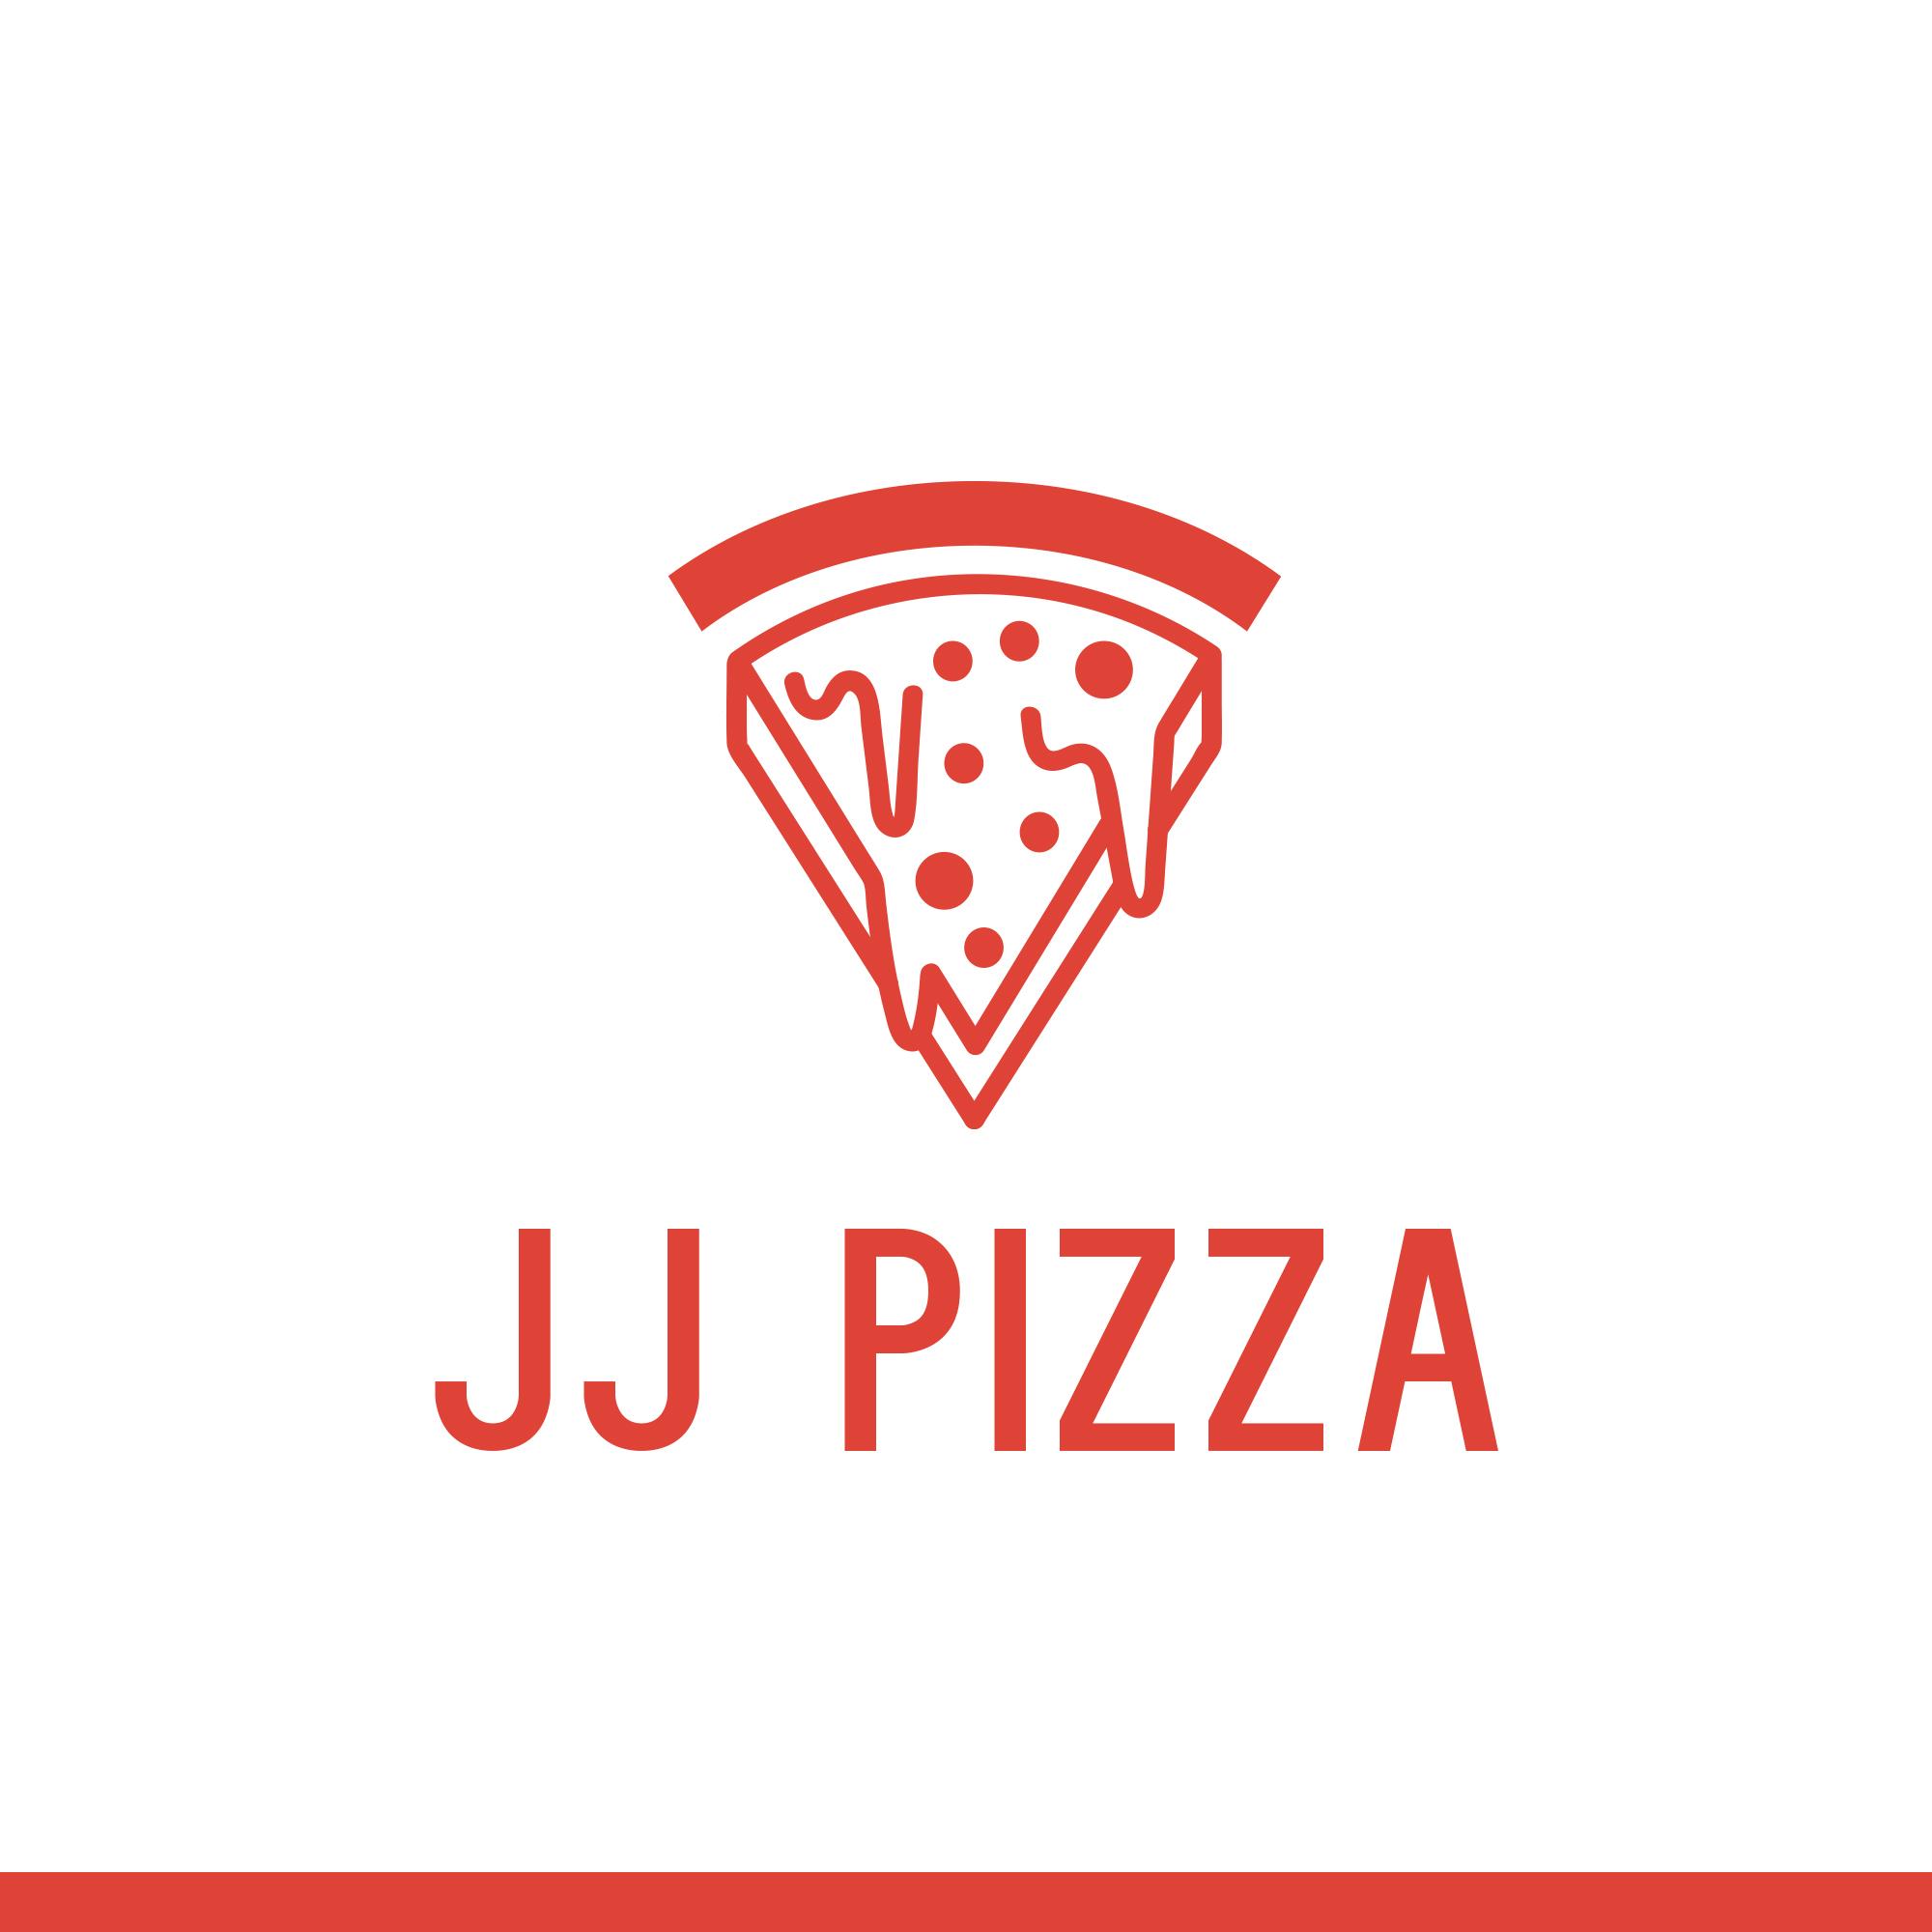 013 JJ Pizza-Color.jpg